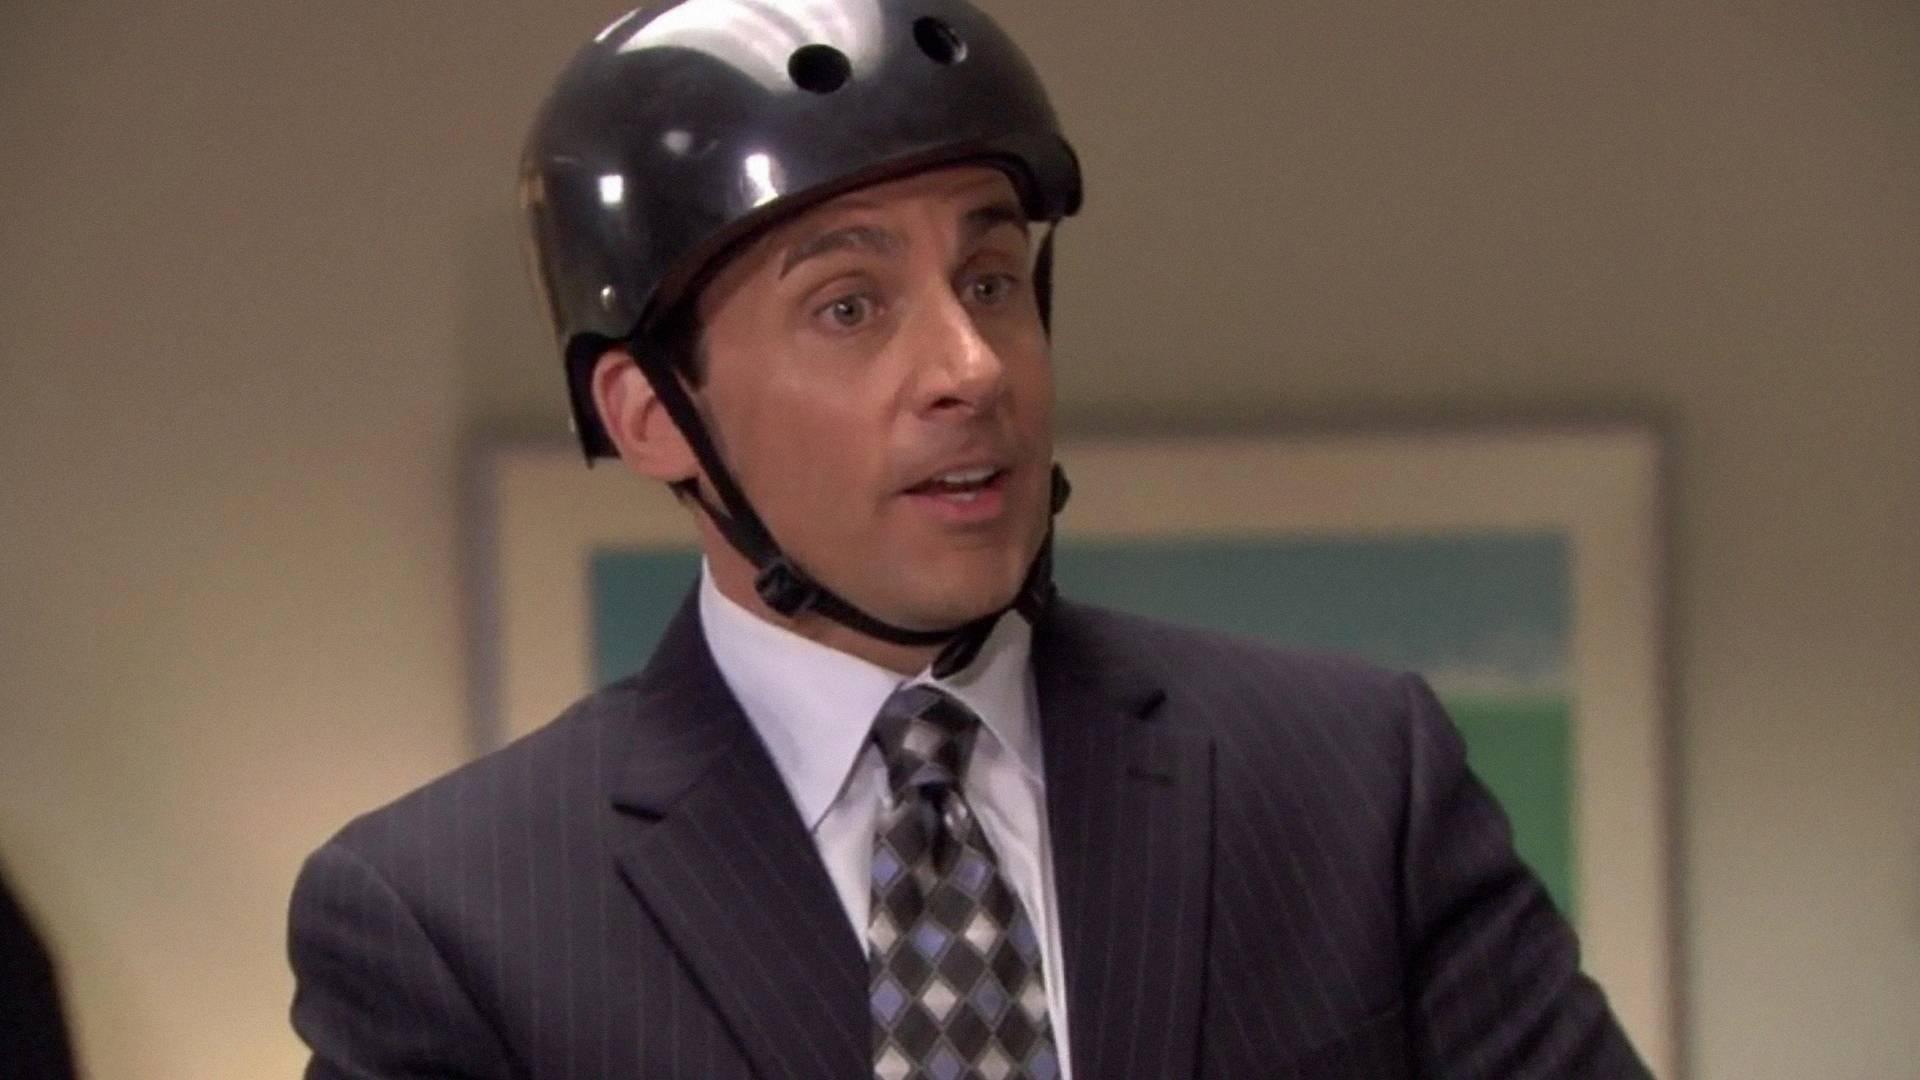 The Office Season 6 Episode 14